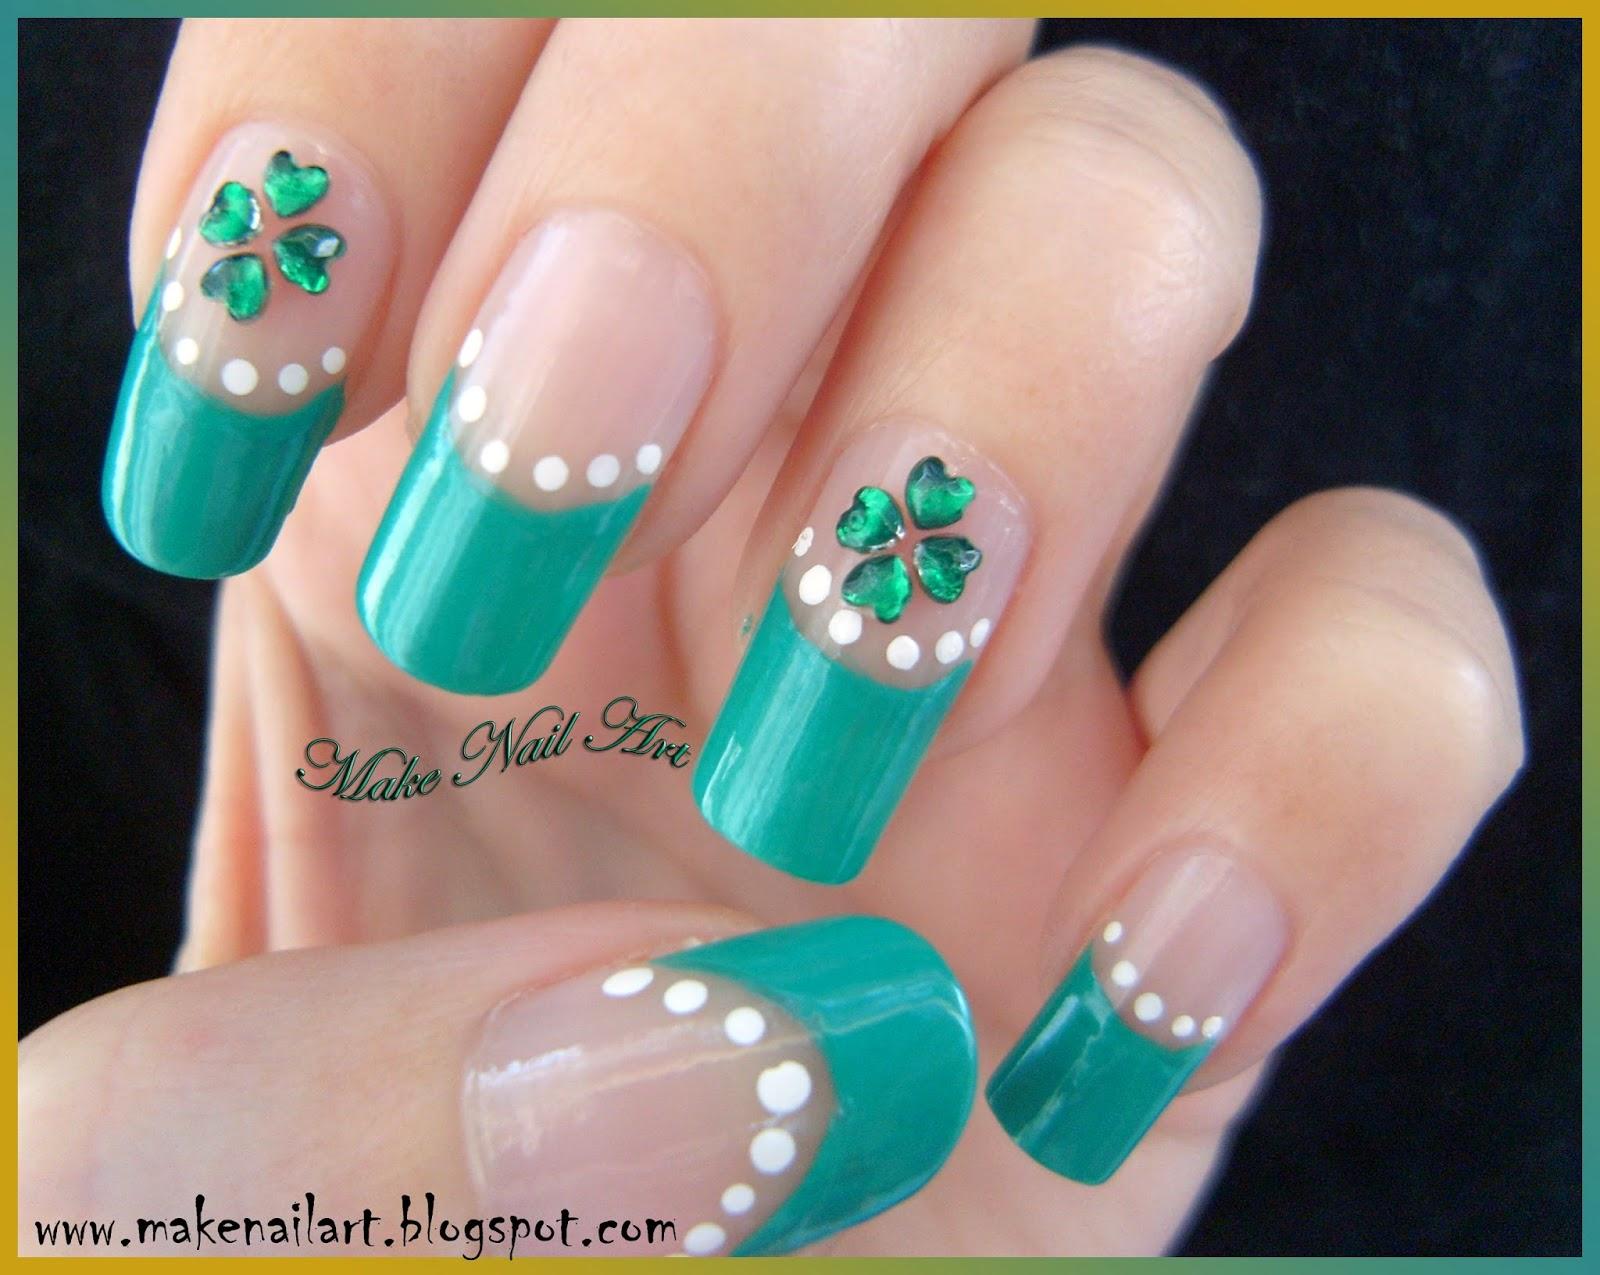 Make Nail Art St Patricks Day Four Leaf Clover Nail Art Tutorial